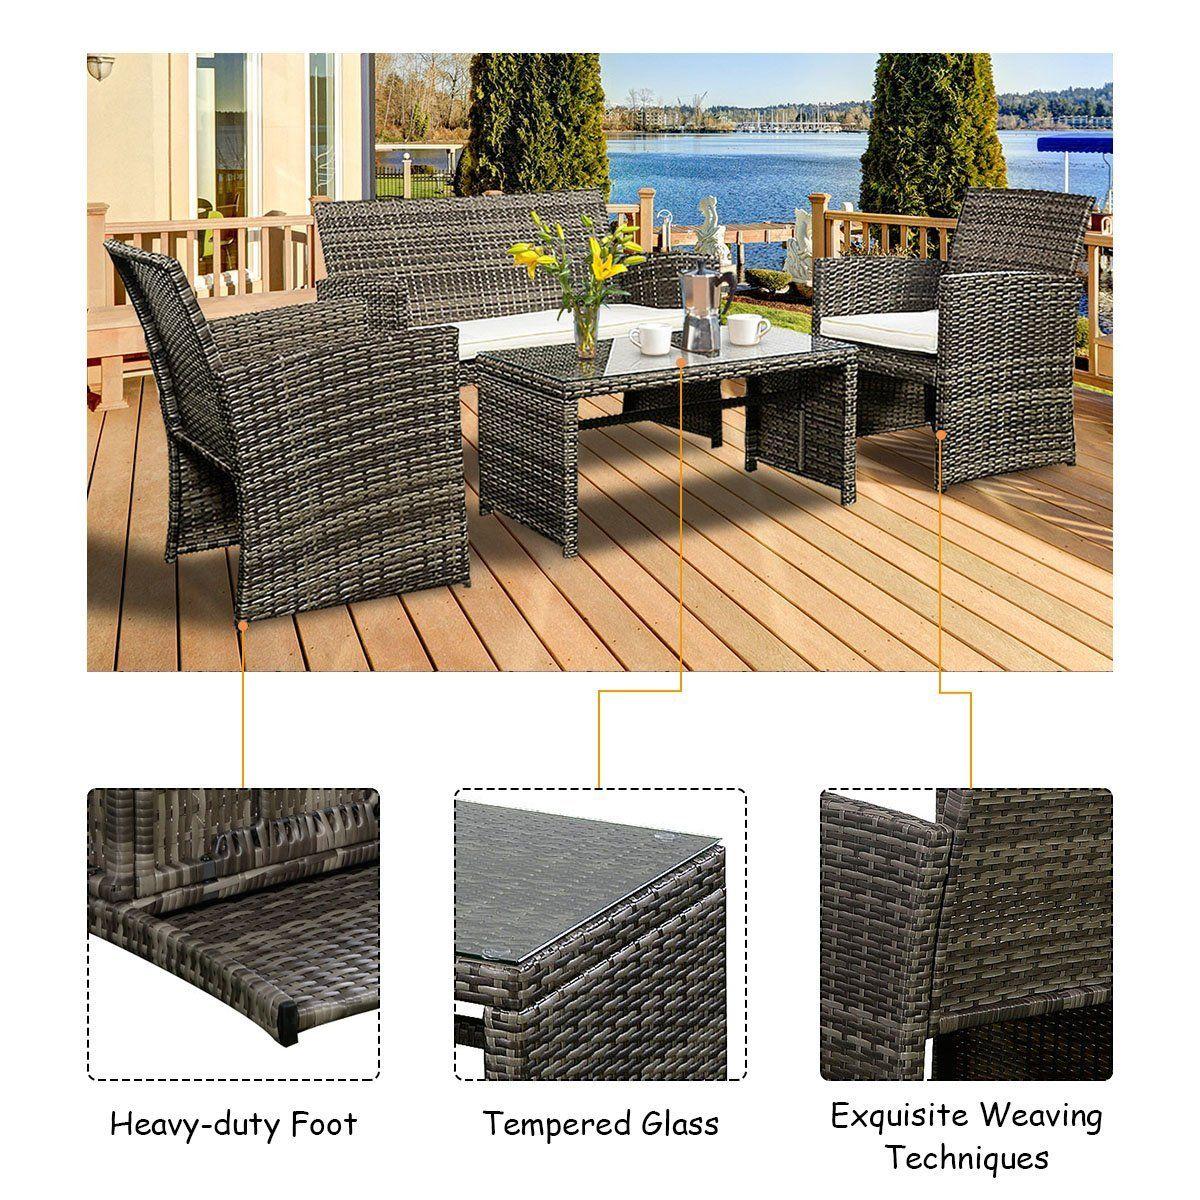 Goplus 4 Pc Rattan Patio Furniture Set Garden Lawn Sofa Cushioned Seat Wicker Sofa Mix Gray Patio Furnishings Outdoor Lounge Furniture Rattan Patio Furniture